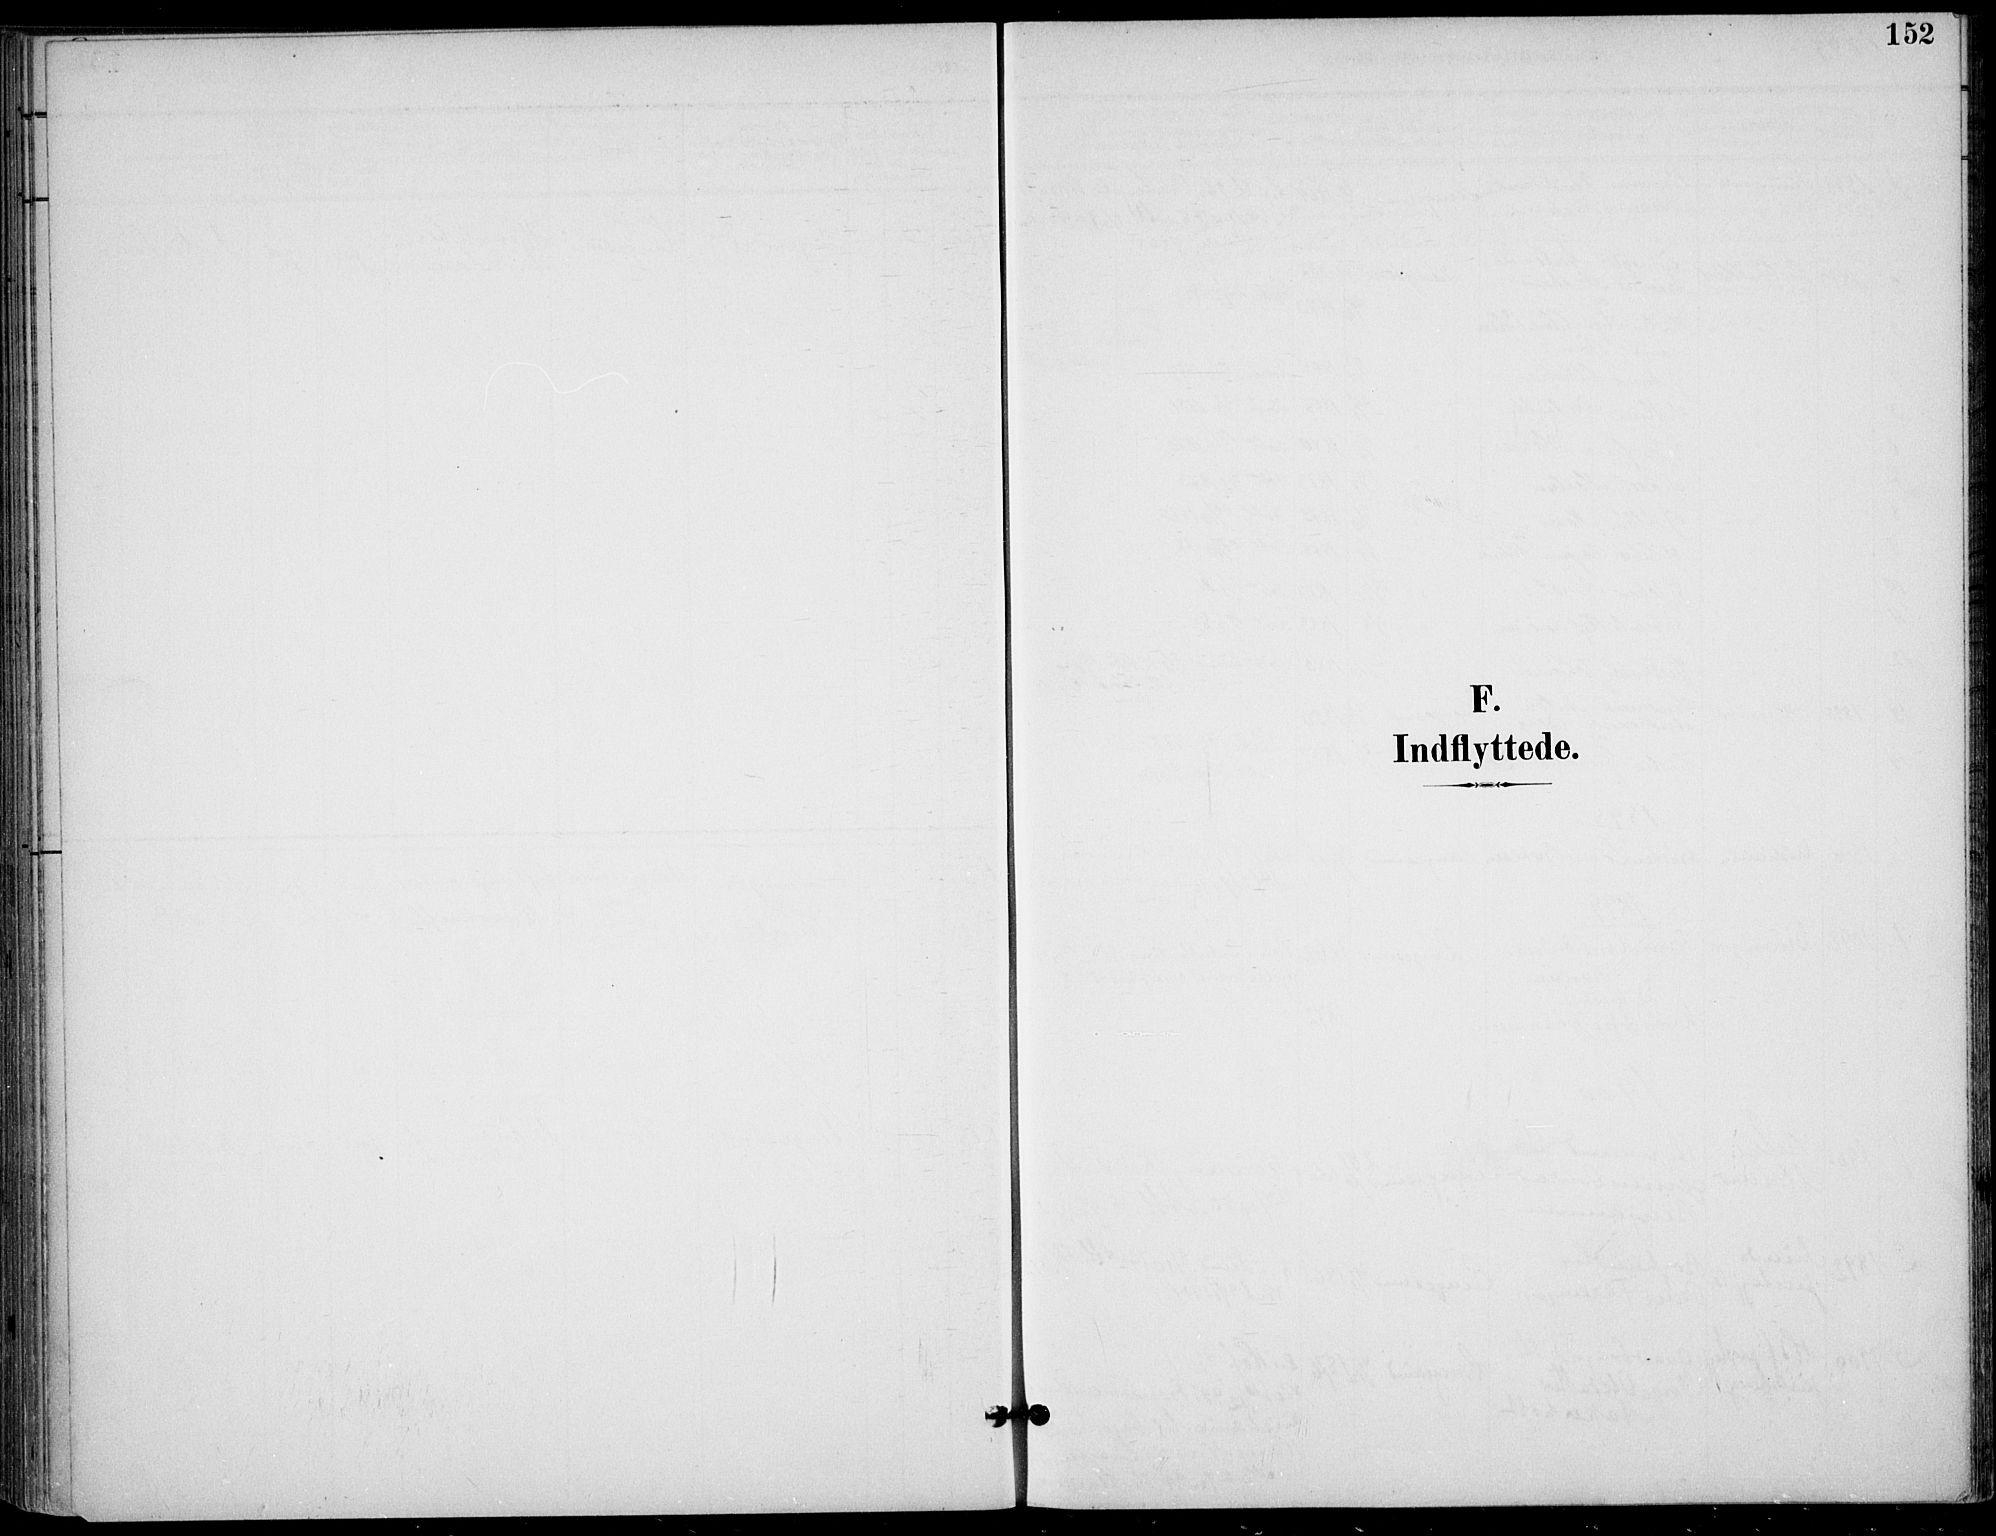 SAKO, Langesund kirkebøker, F/Fa/L0003: Ministerialbok nr. 3, 1893-1907, s. 152